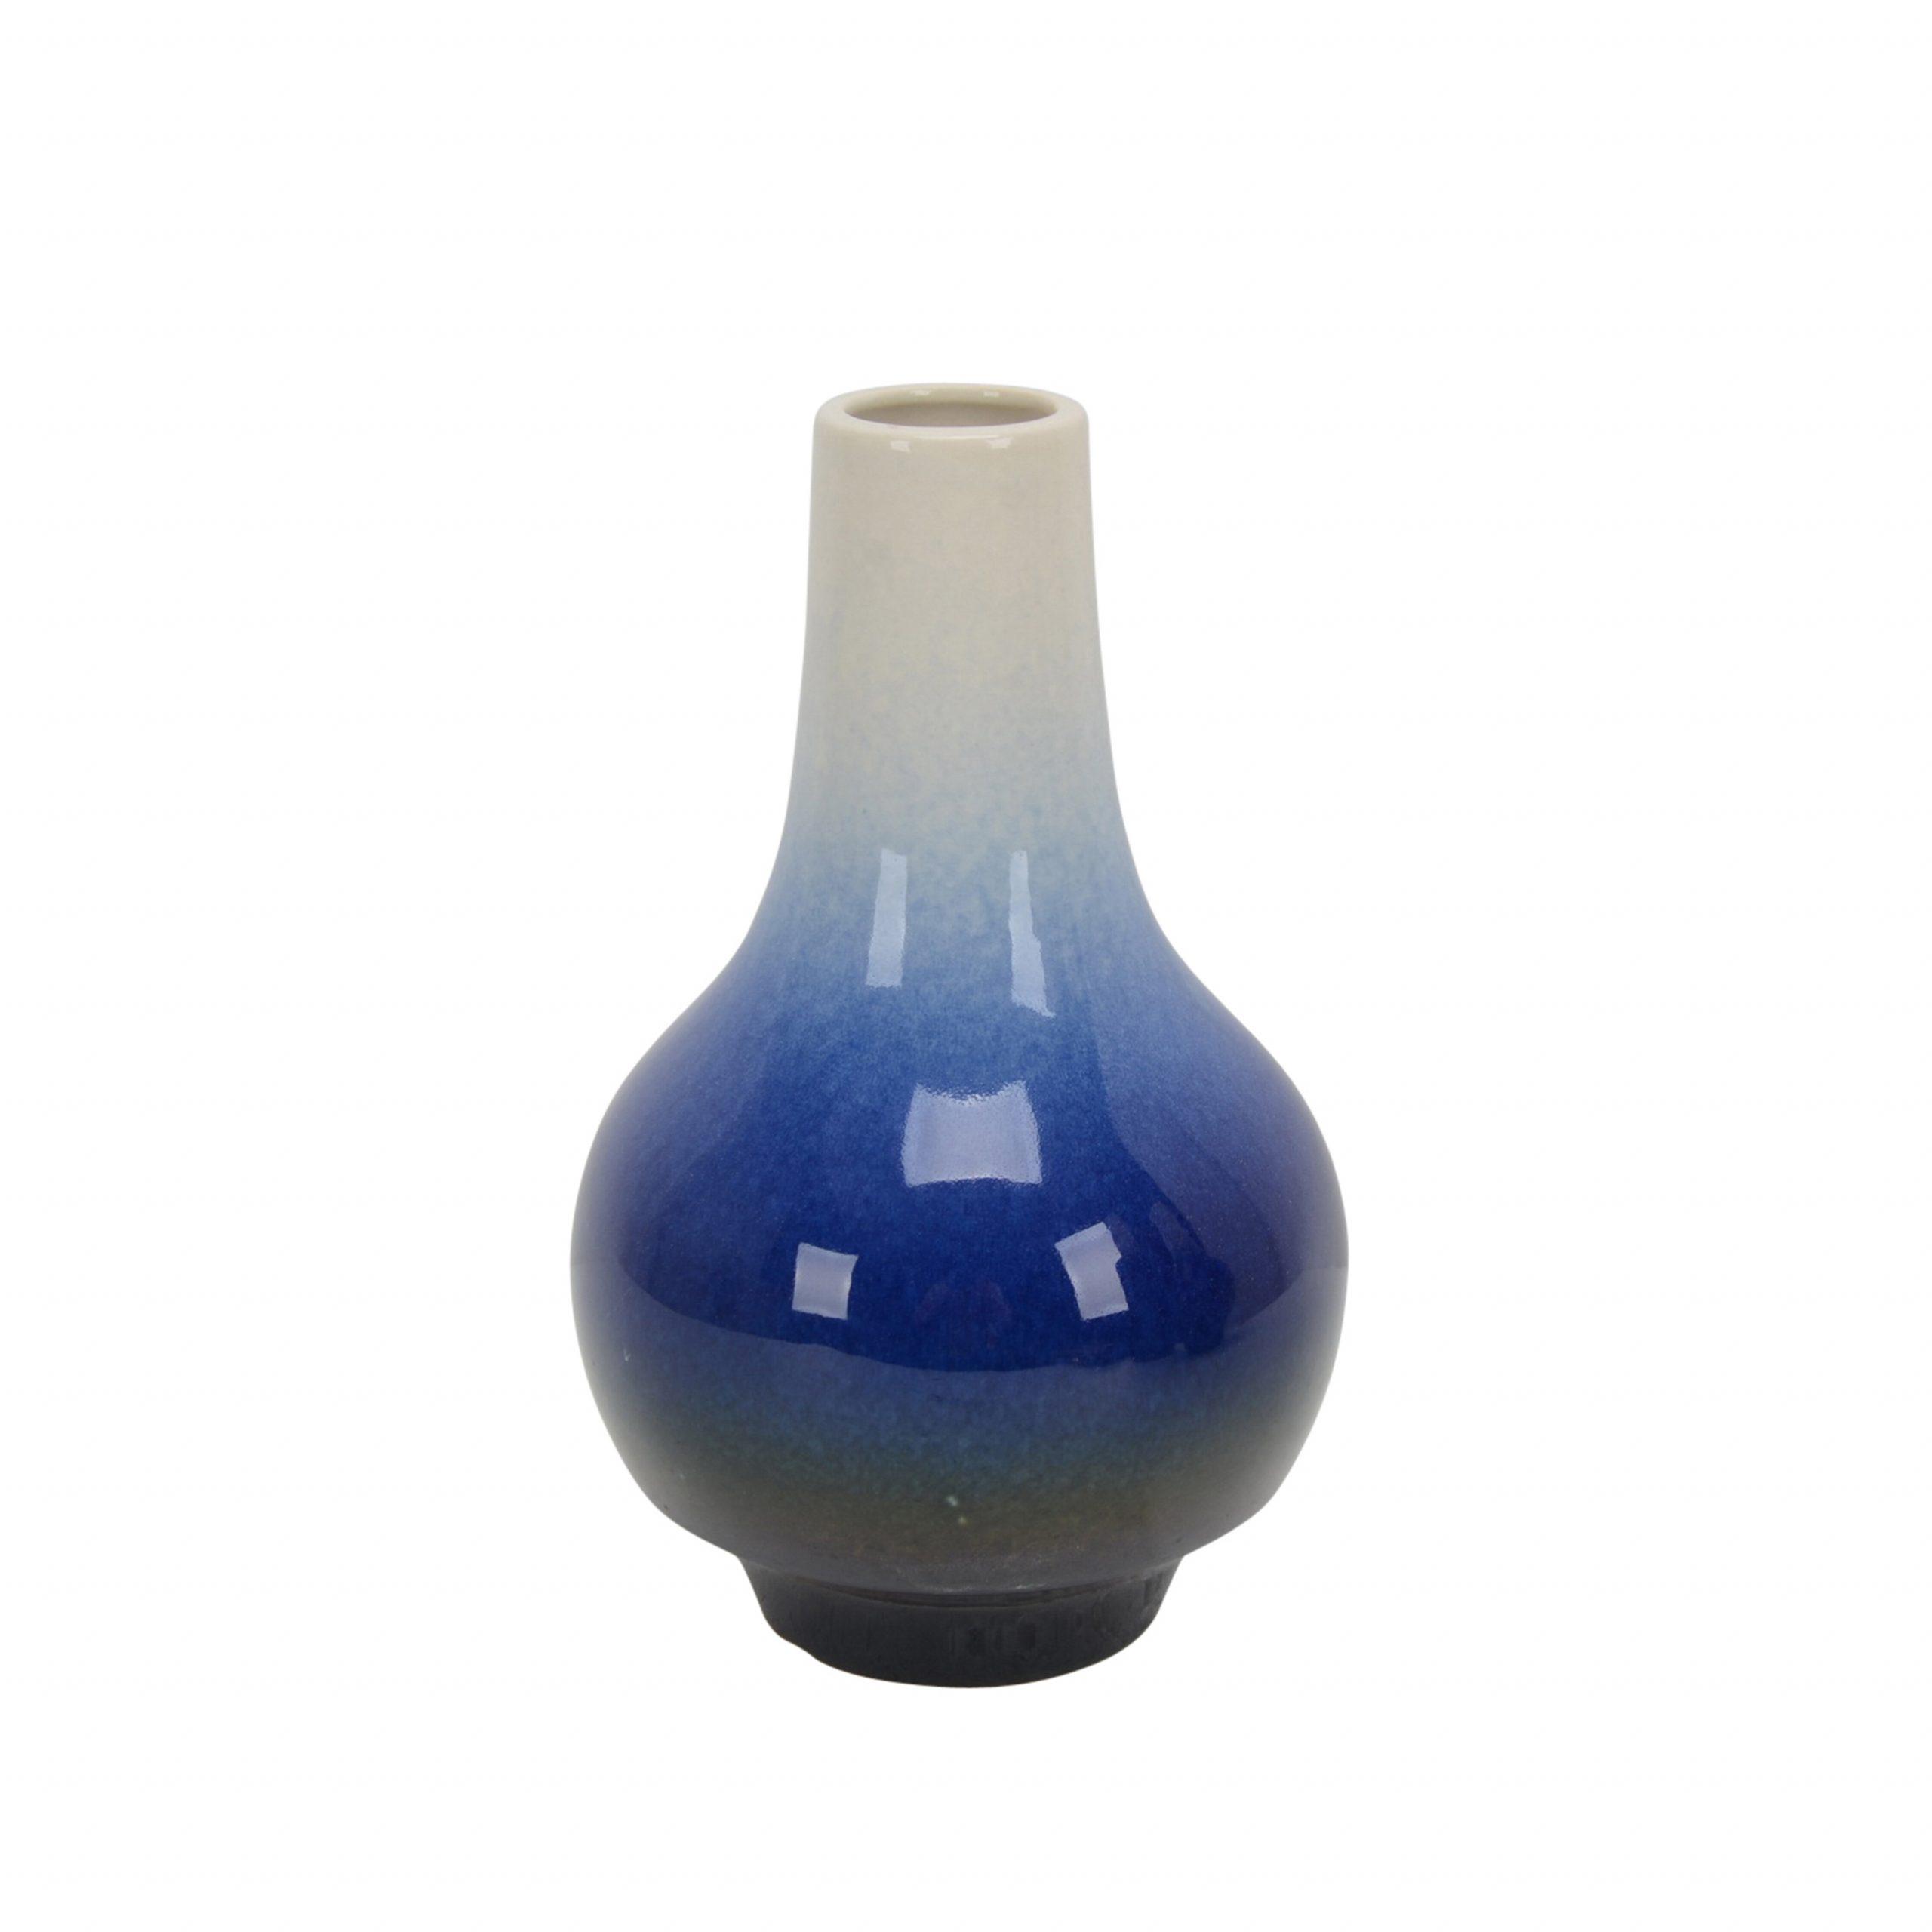 Aloysius Ceramic Table Vase Throughout Aloysius Ceramic Garden Stools (View 11 of 25)